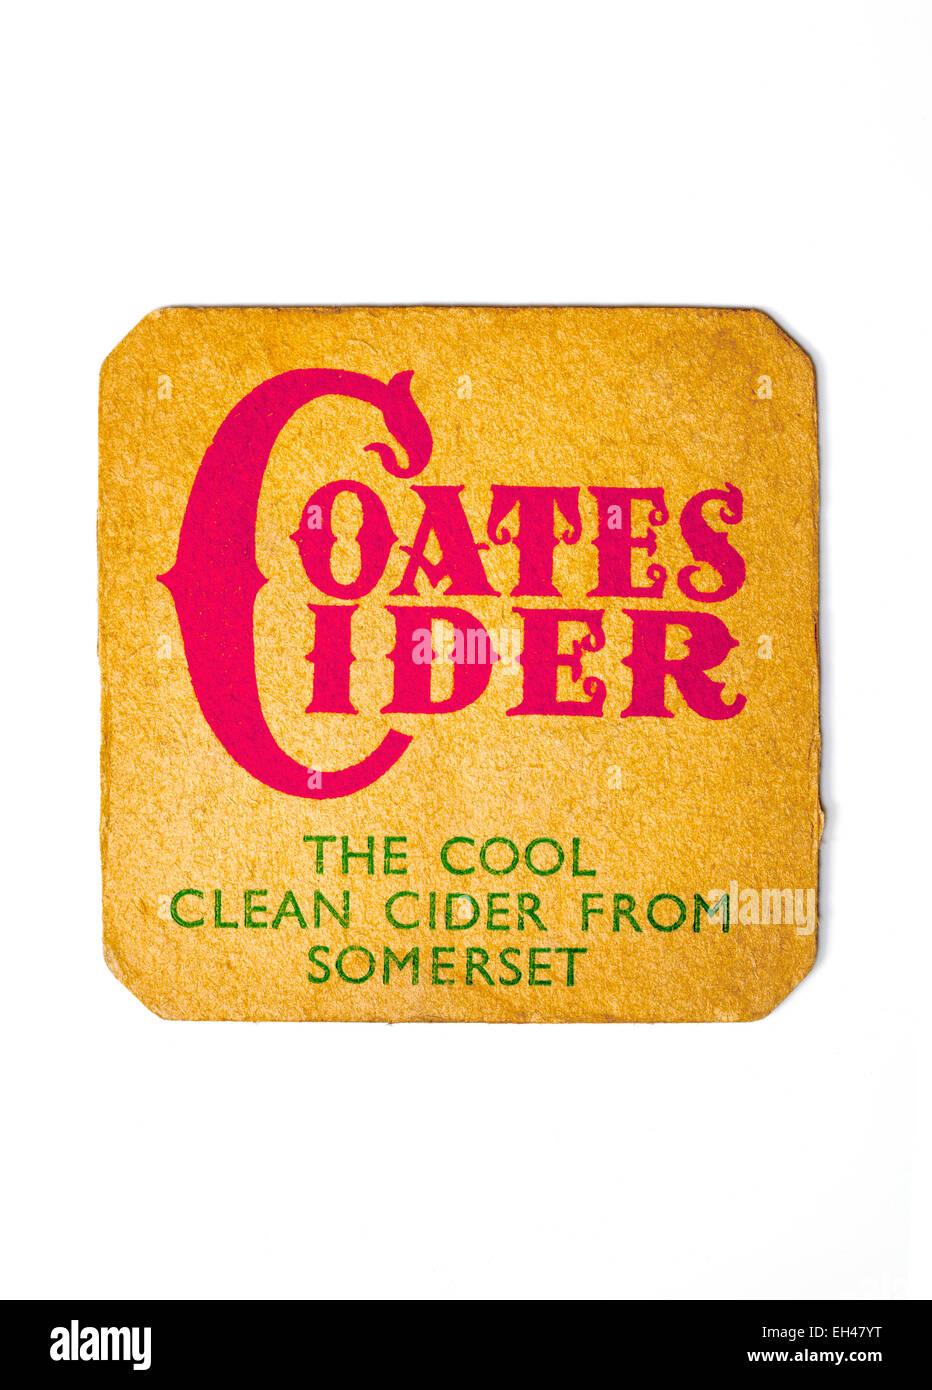 Vintage British Beermat Advertising Coates Cider - Stock Image